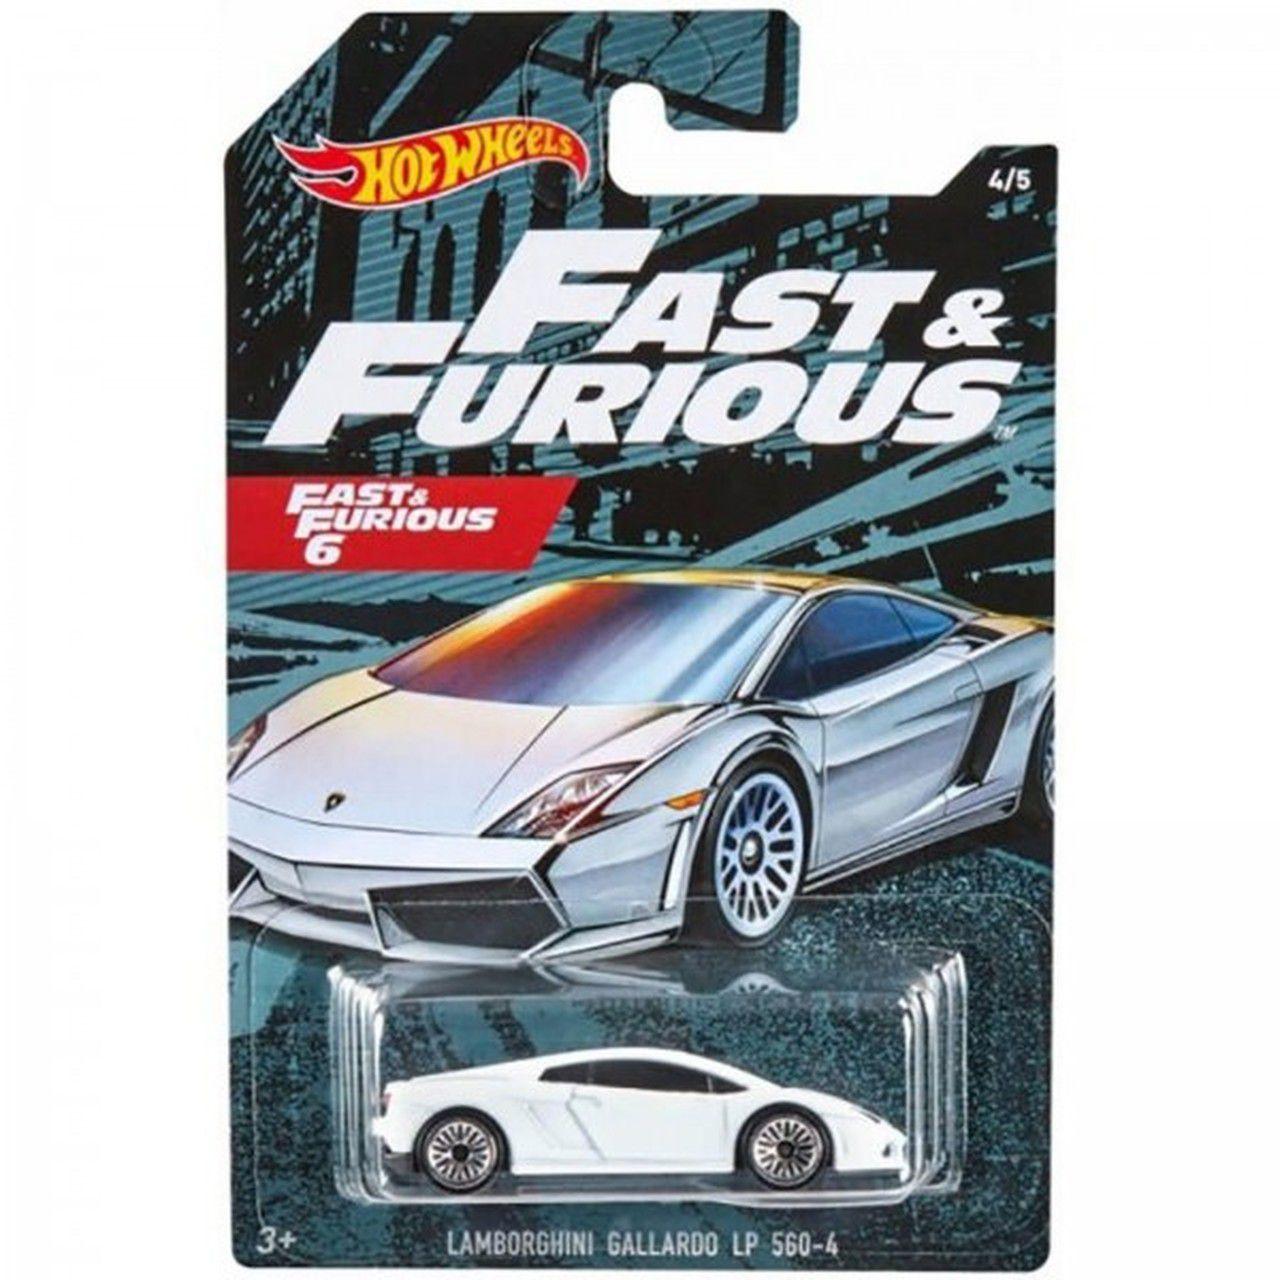 Carrinho Lamborghini Gallardo LP 560-4: Velozes e Furiosos 6 (Fast & Furious) - Hot Wheels